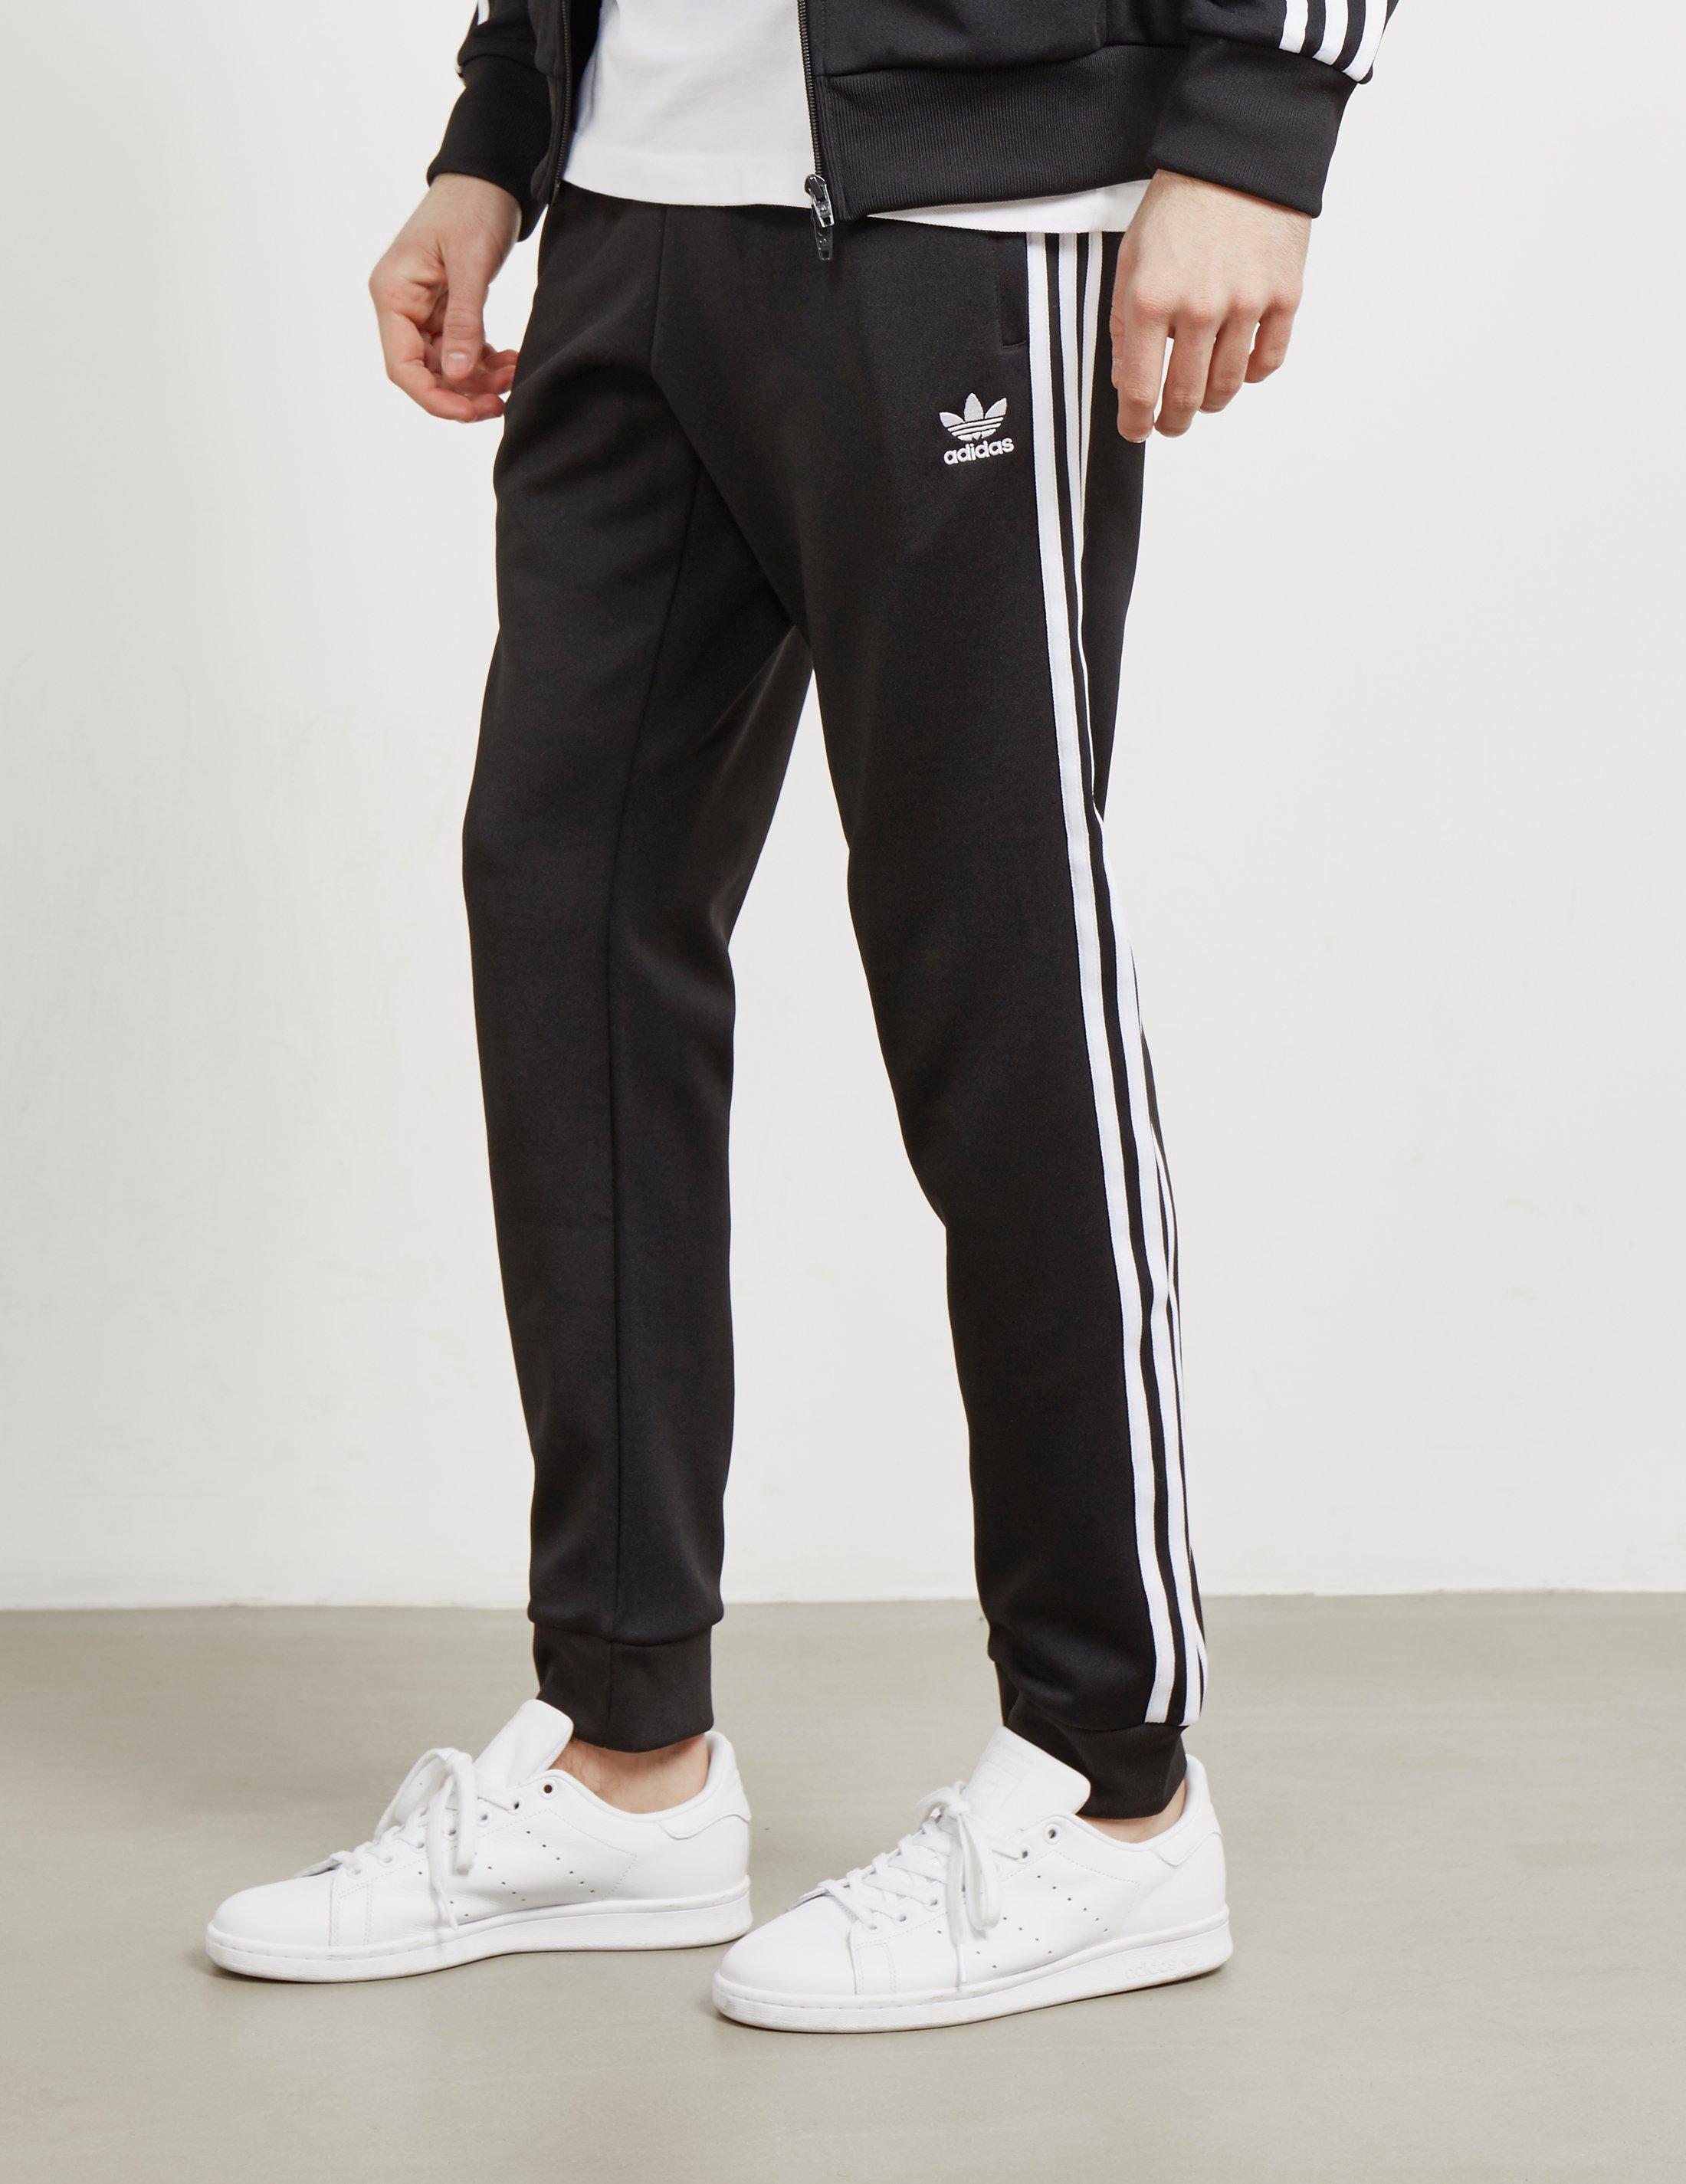 300641643 adidas Originals Superstar Cuffed Track Pants Black in Black - Lyst